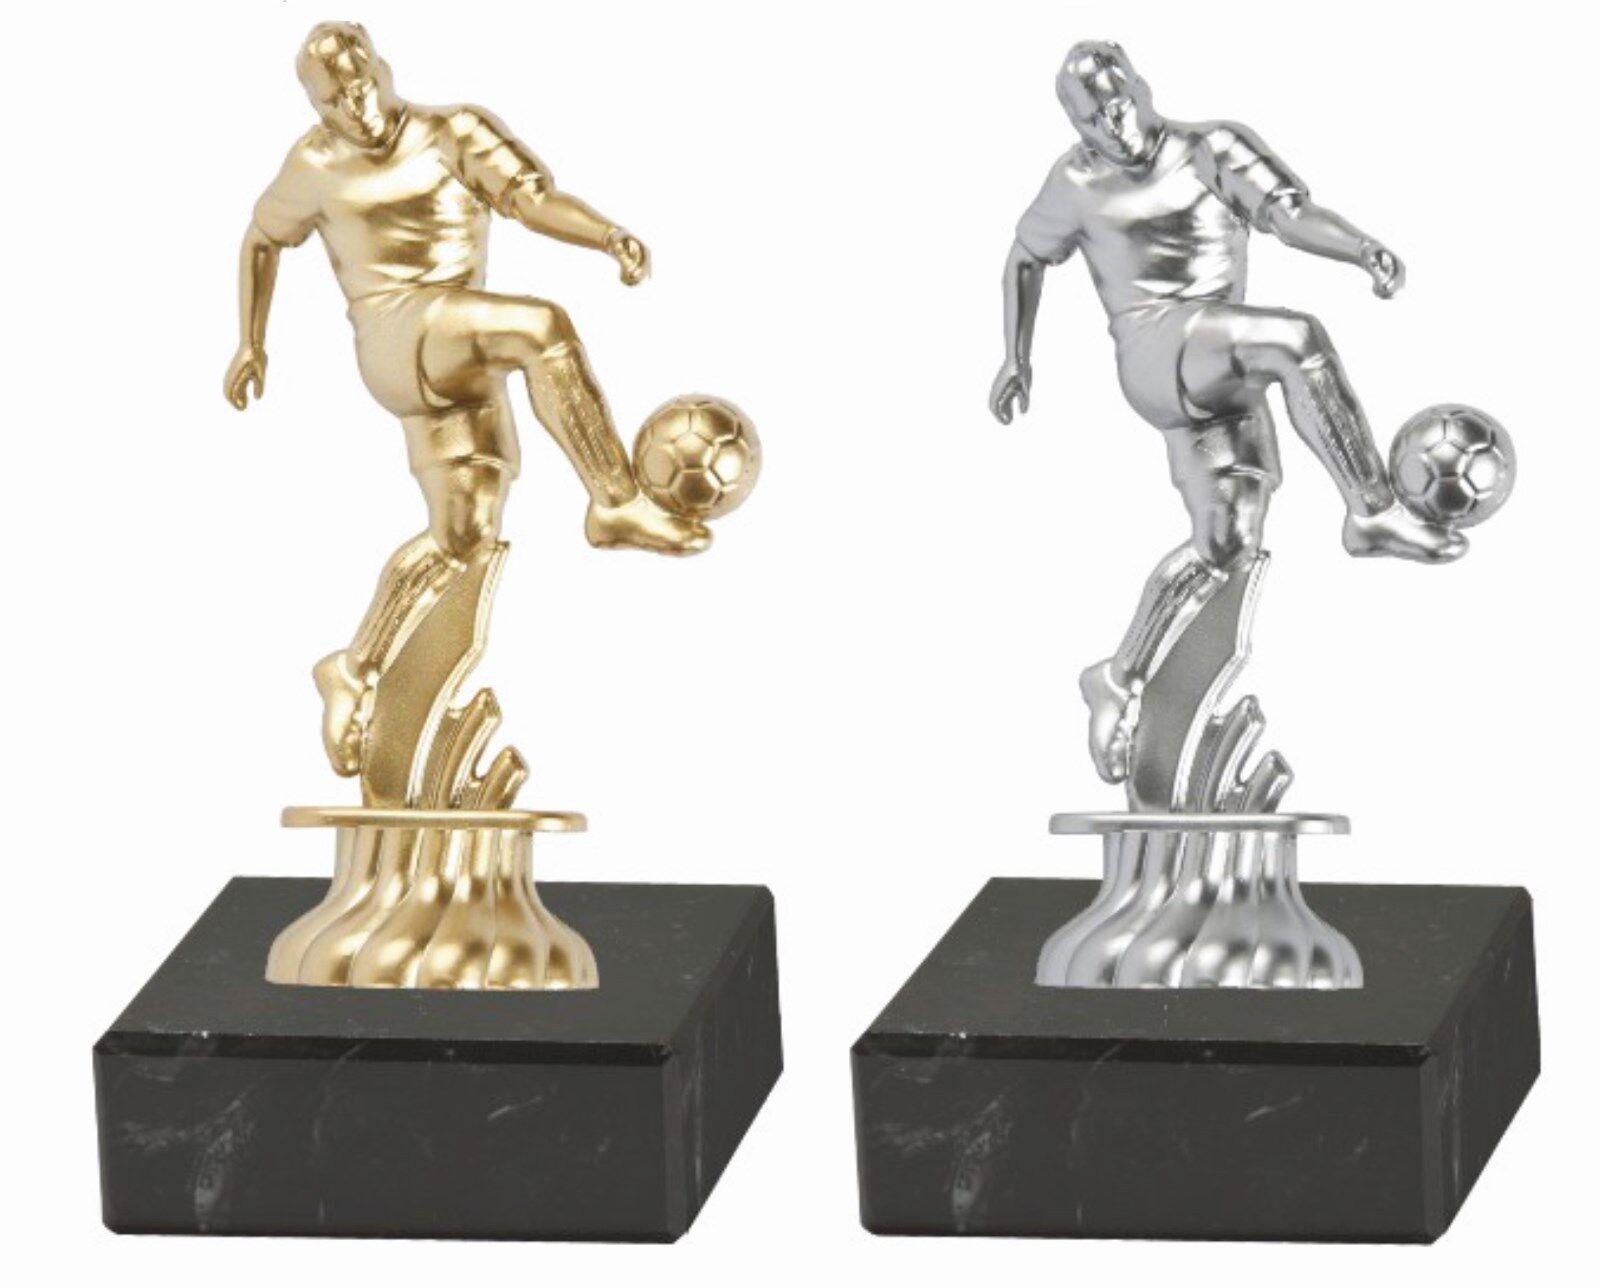 Fußballpokal Fußballständer Fußballtrophäe Fußballtrophäe Fußballtrophäe Pokal Fußballmedaille Fußballpokale c30e5f